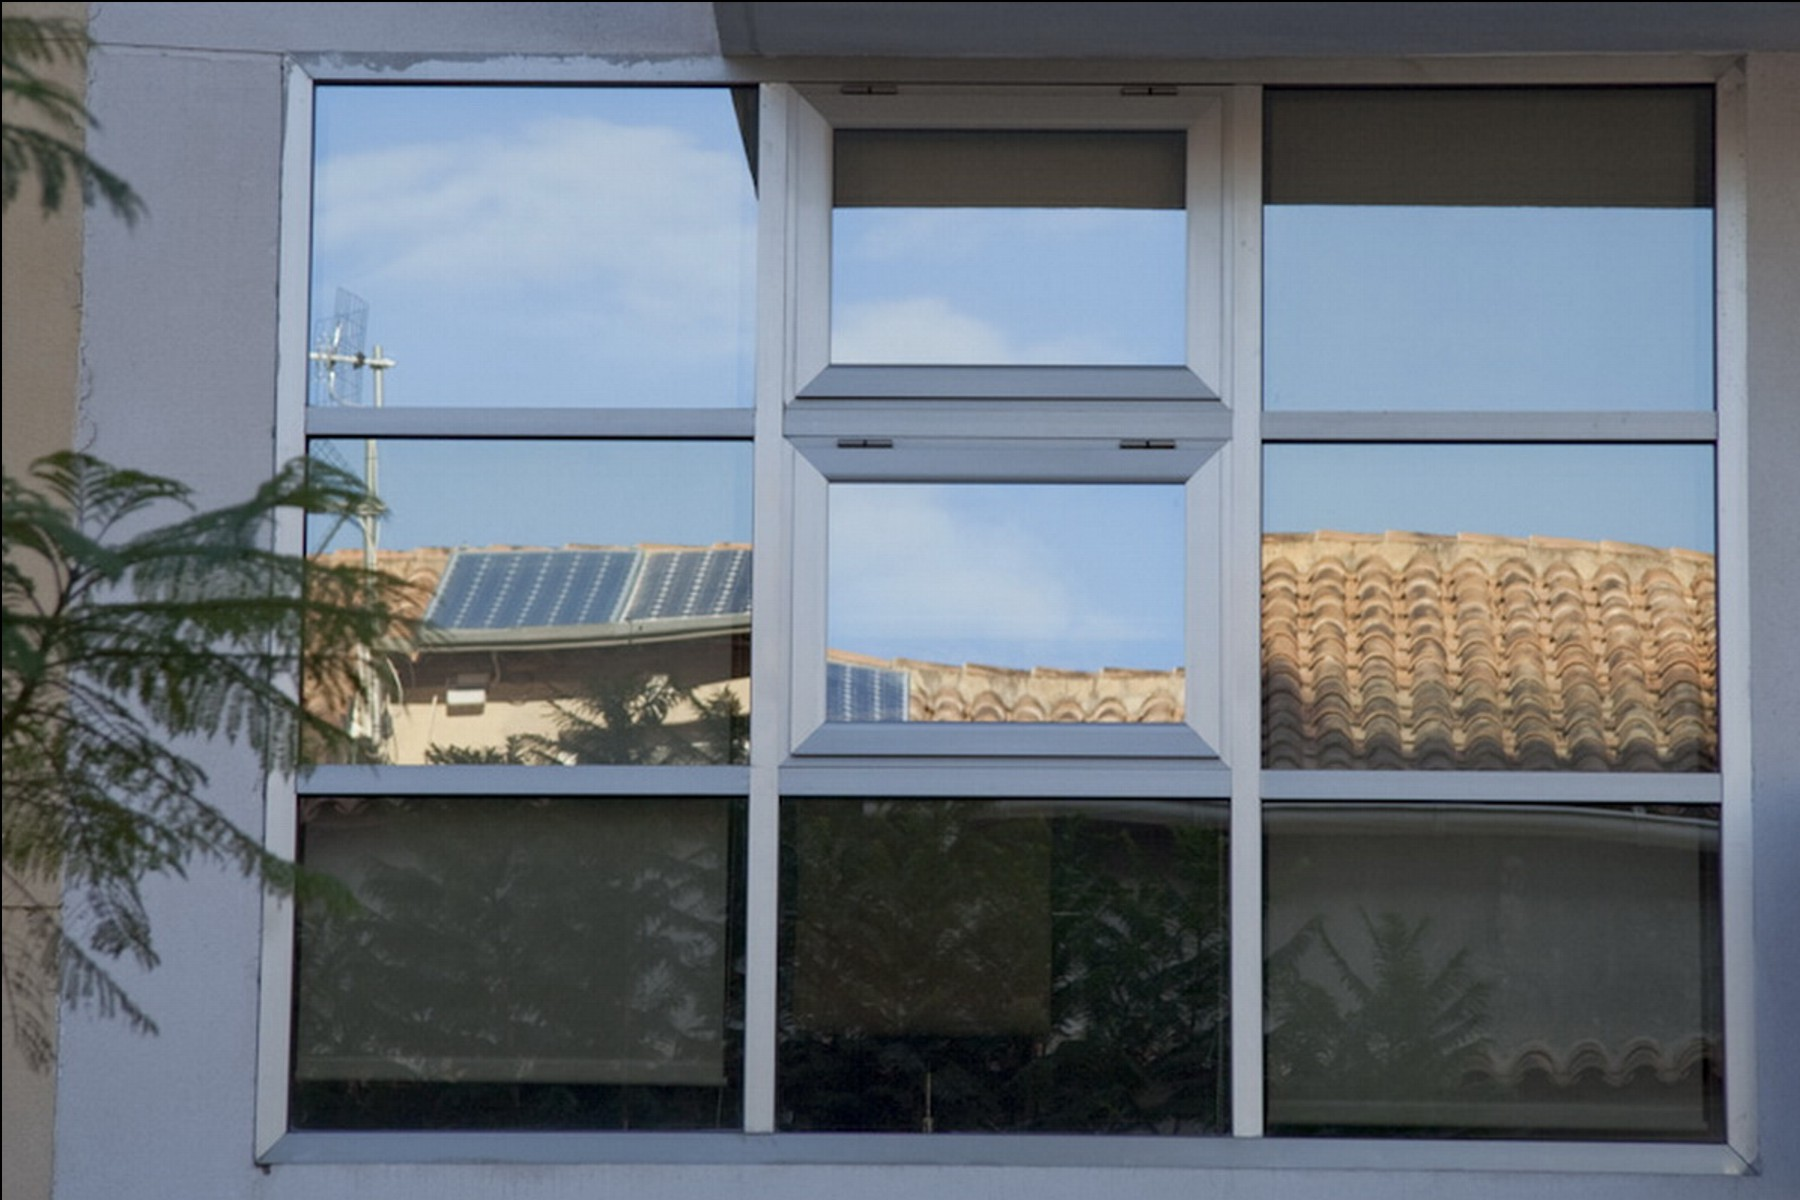 Imaginarq-042-edificio-viviendas.-Pego.-Alicante.08A